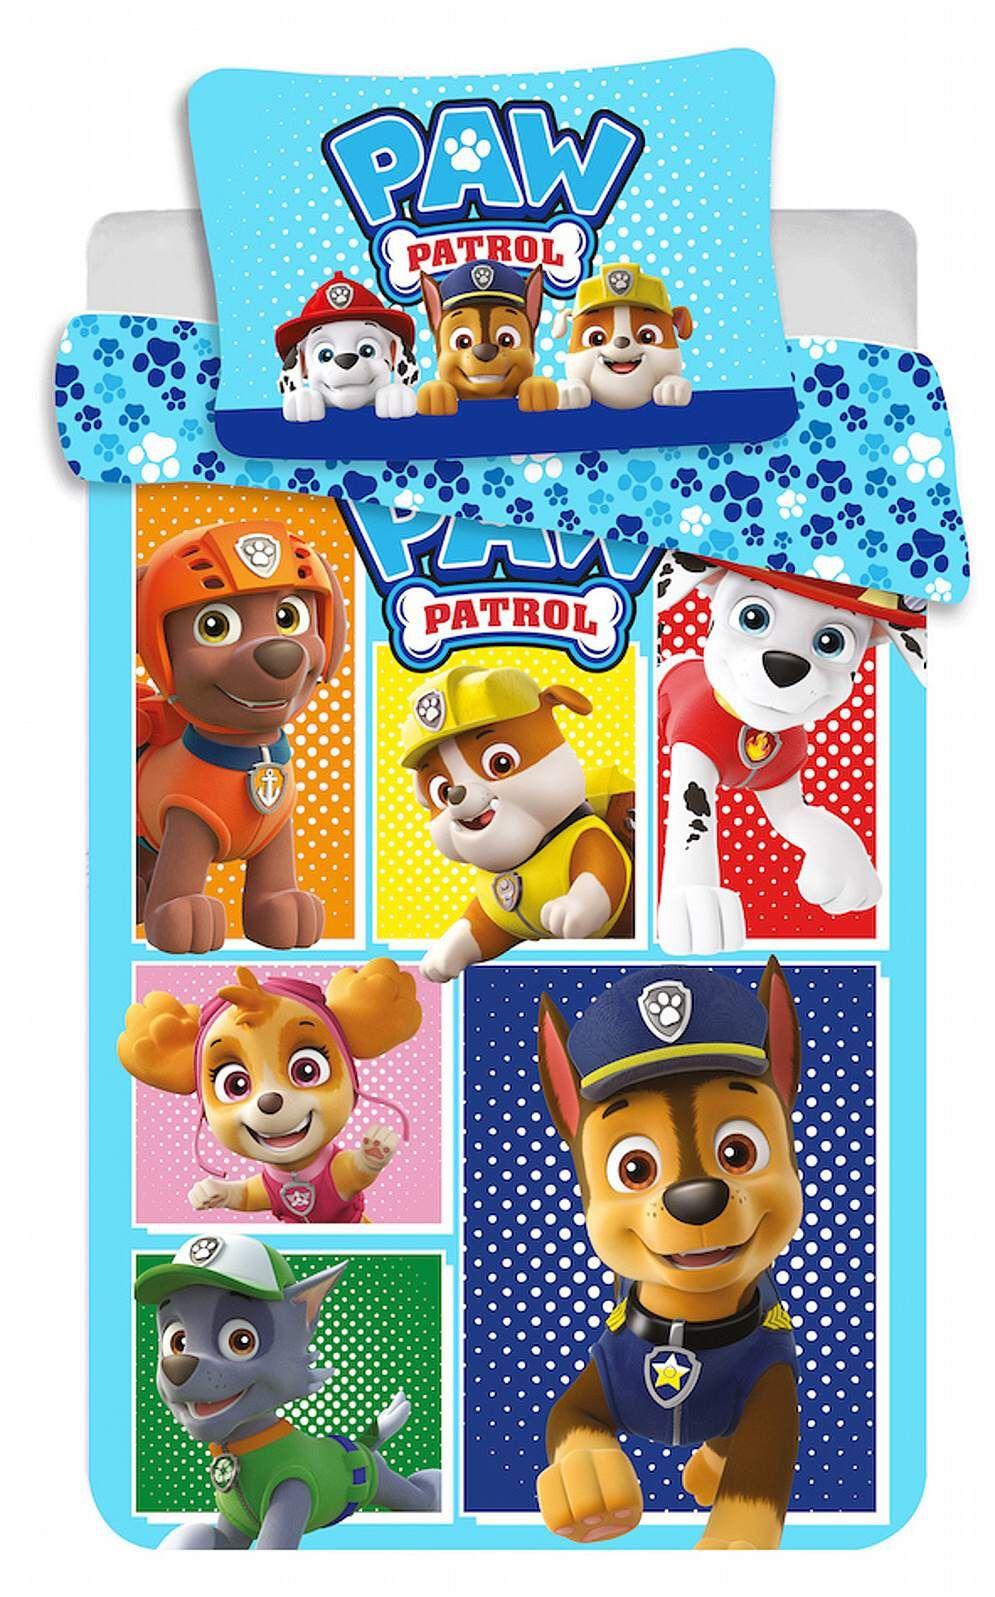 Disney obliečky do postieľky Paw Patrol 184 baby Jerry Fabrics